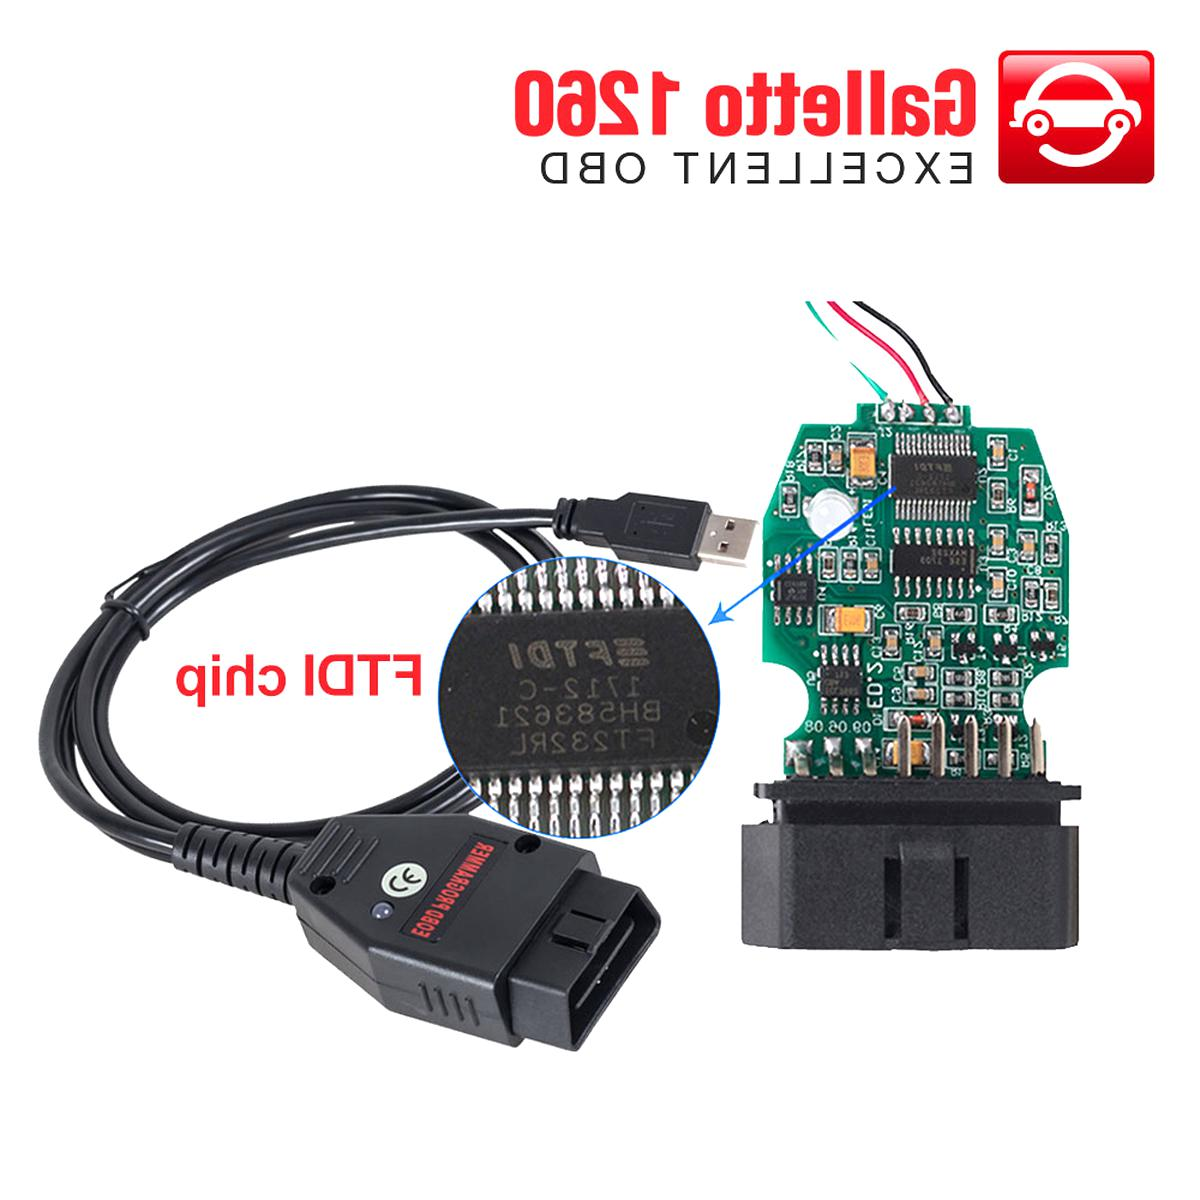 Schwarz /… ABS Galletto 1260 ECU Chip Tuning Tool EOBD//OBD2//OBDII Autodiagnosekabel Schnittstelle Gorgeri OBD2 Kabel